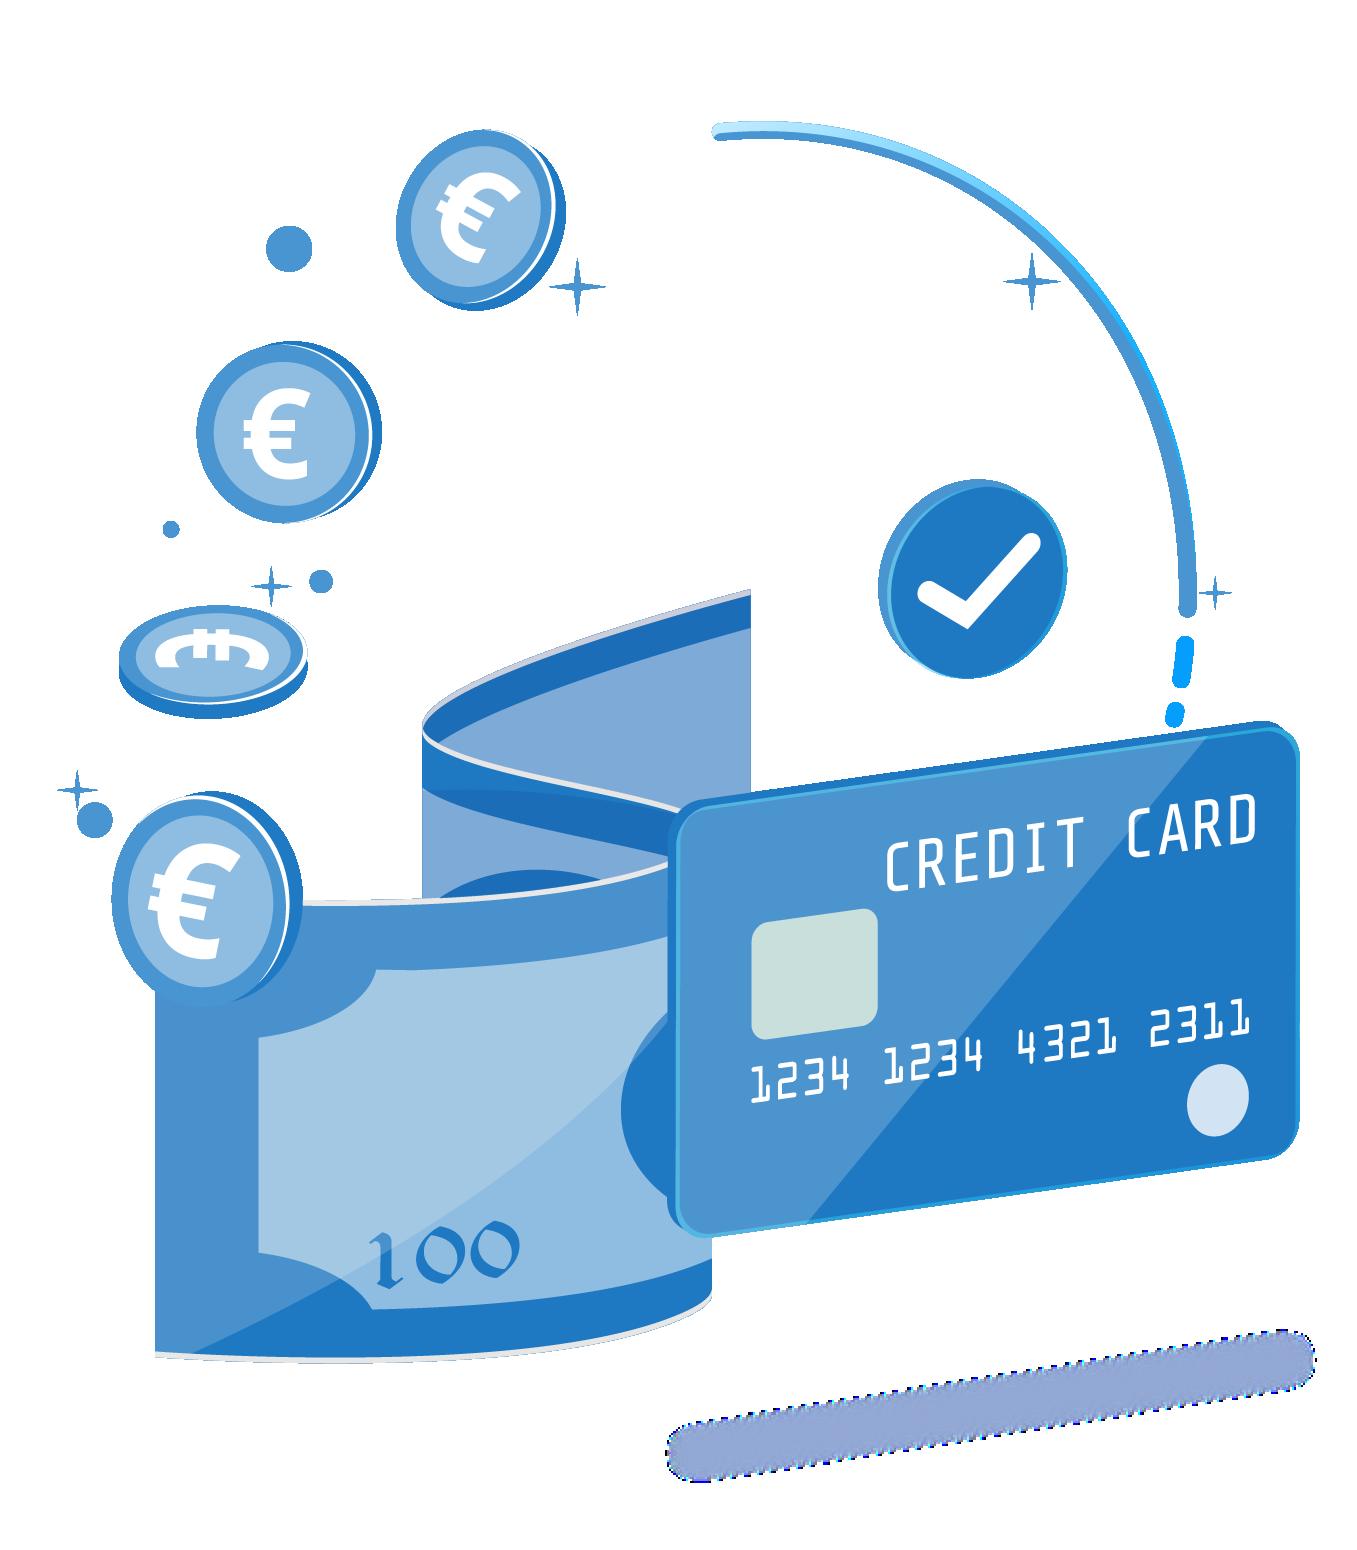 carlo-payment-cash-credit-card-monaco